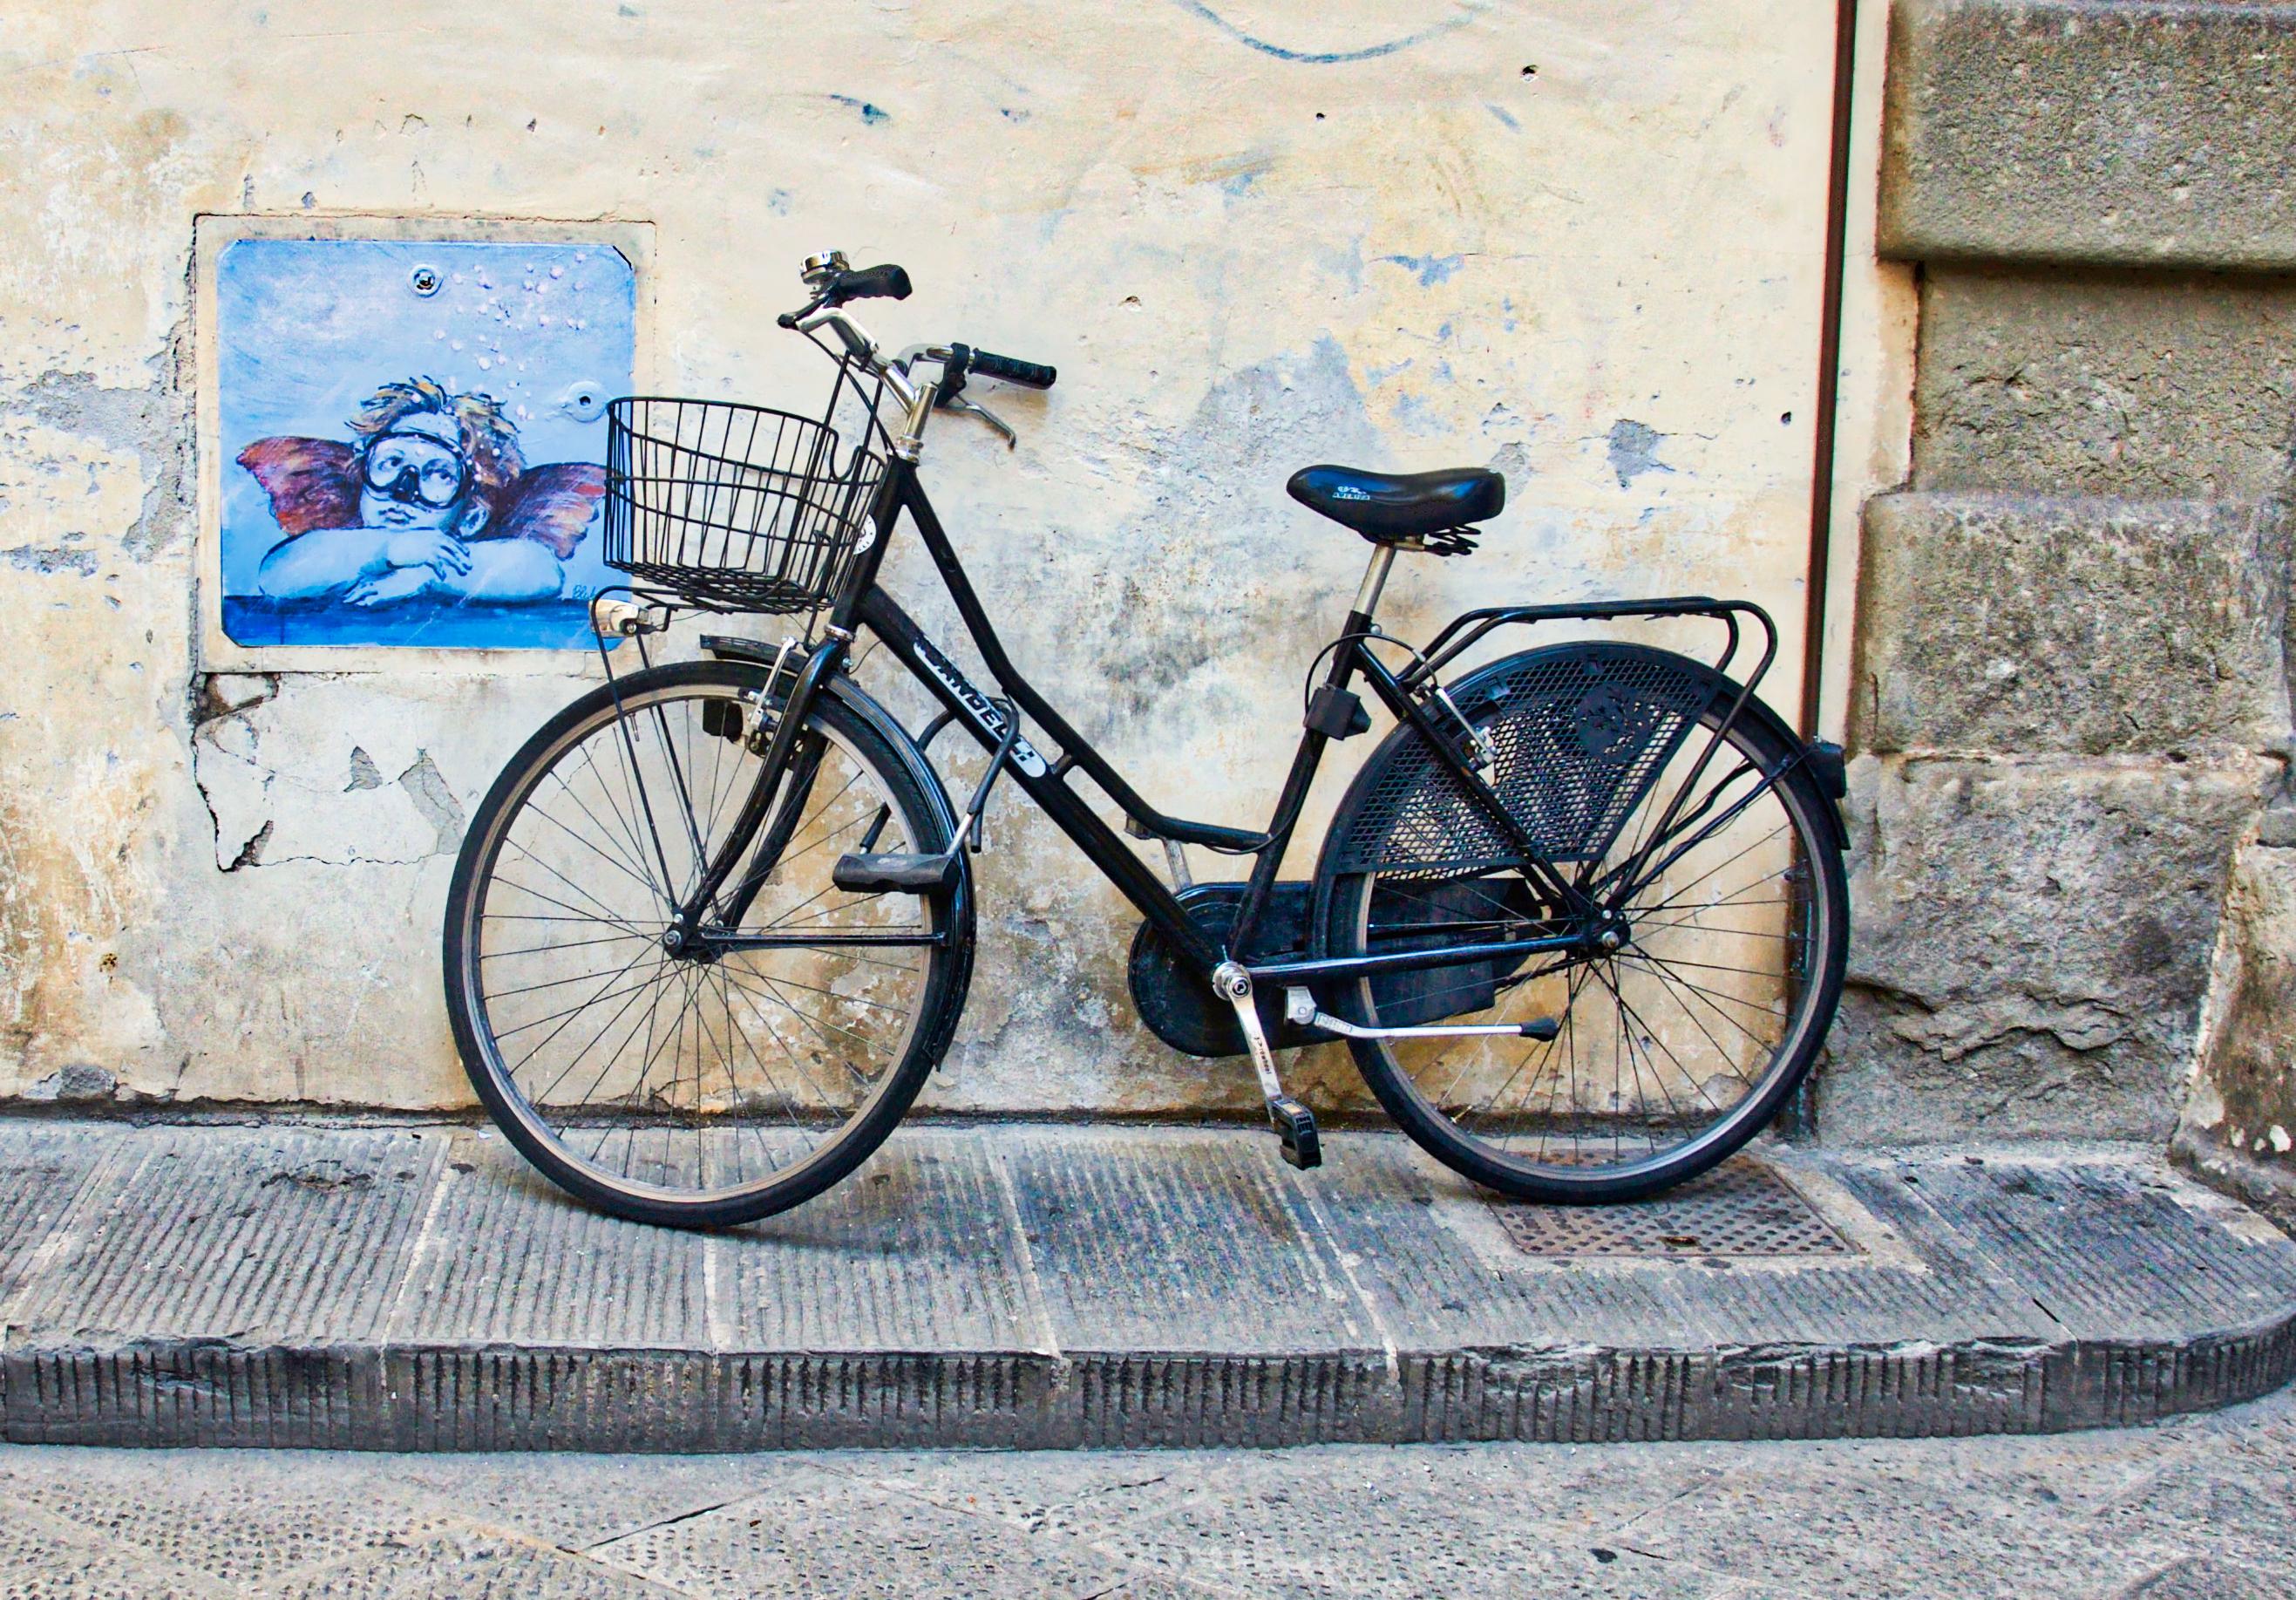 bicicleta-con-angel